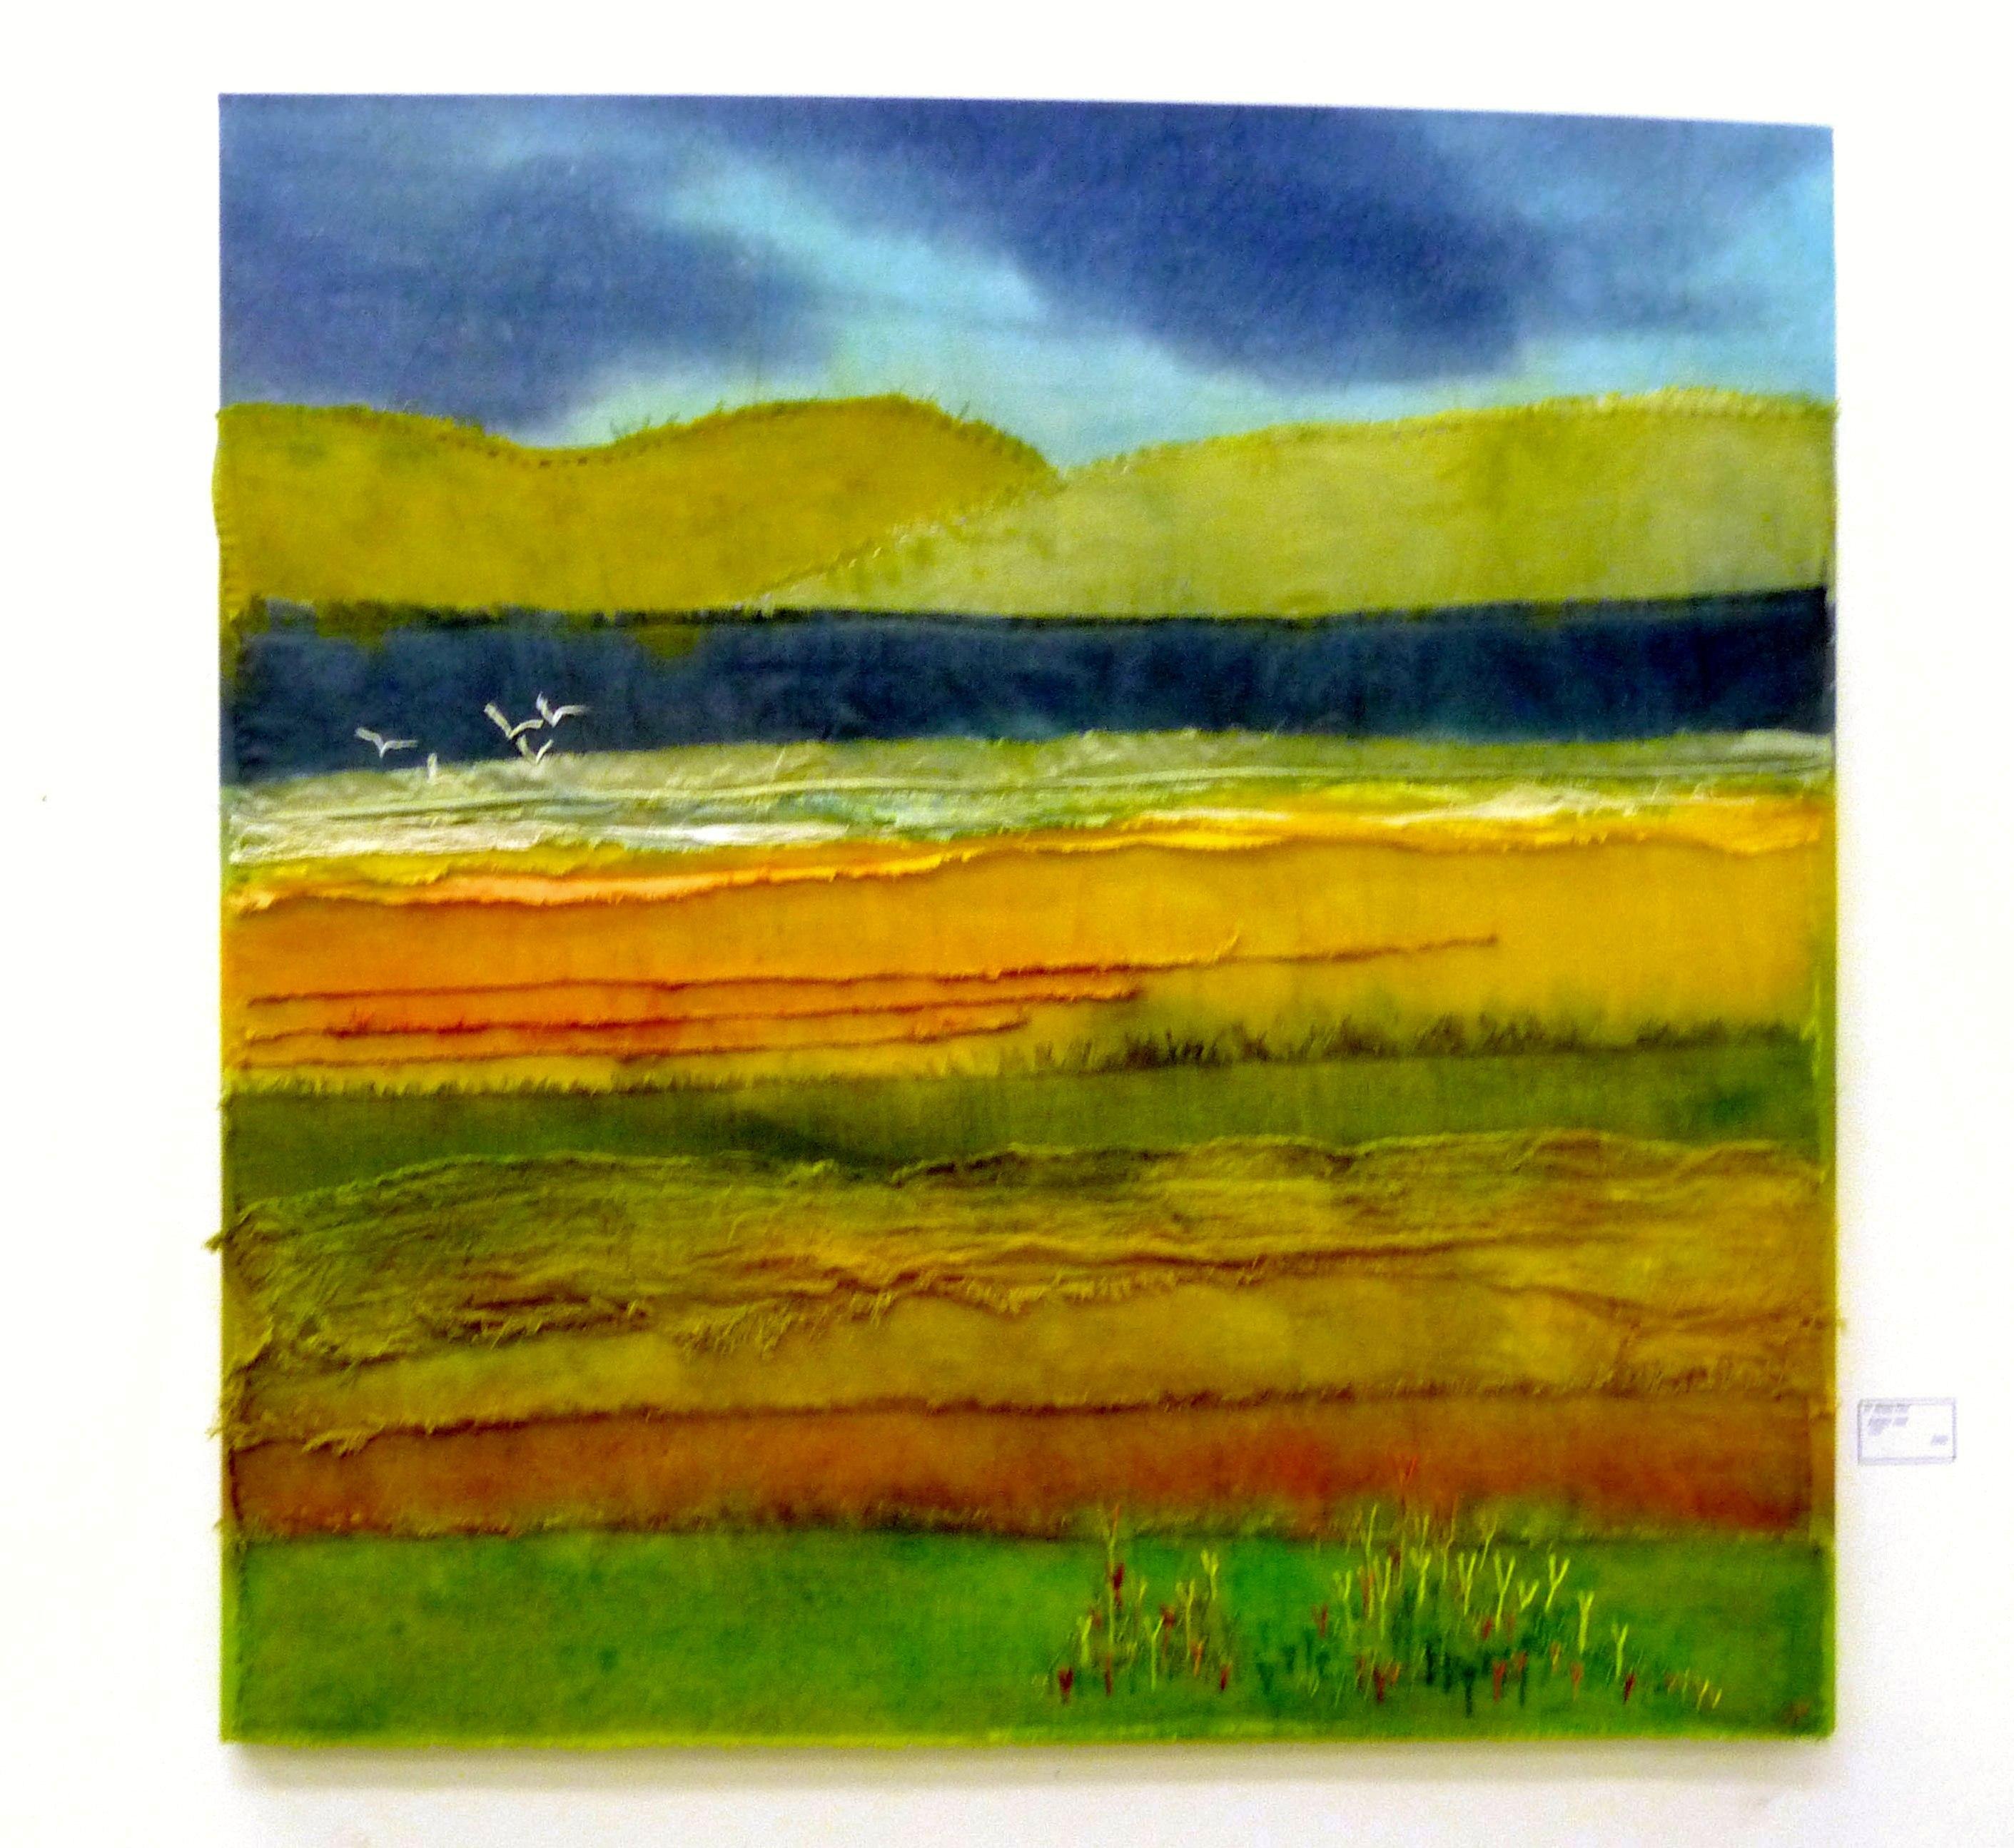 ESTUARY VIEW by Rosey Paul, textile